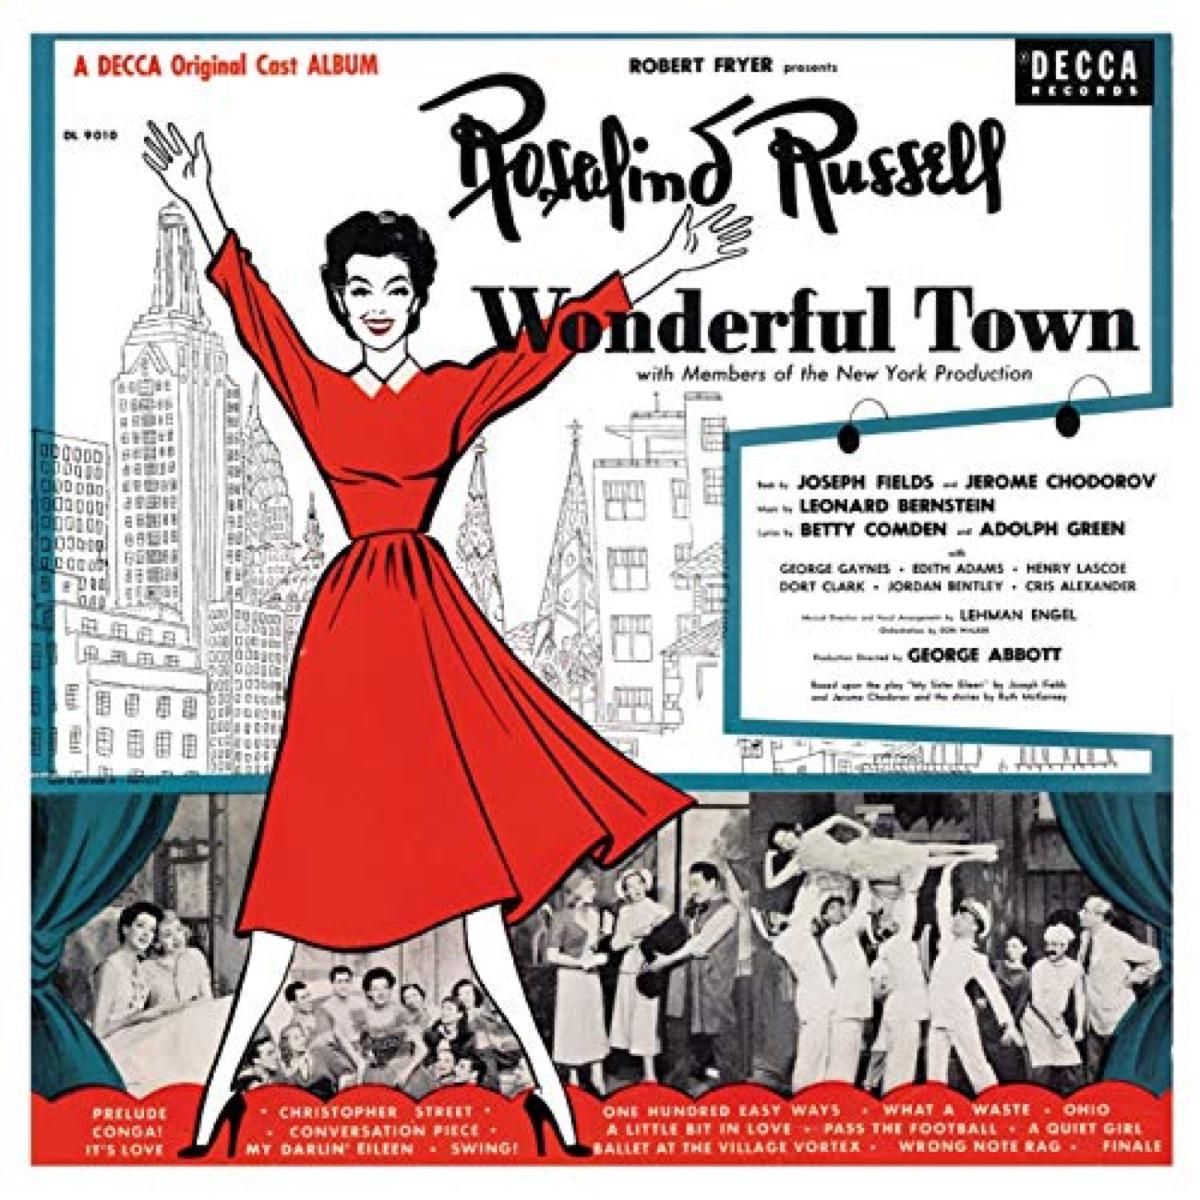 wonderful town cast recording,